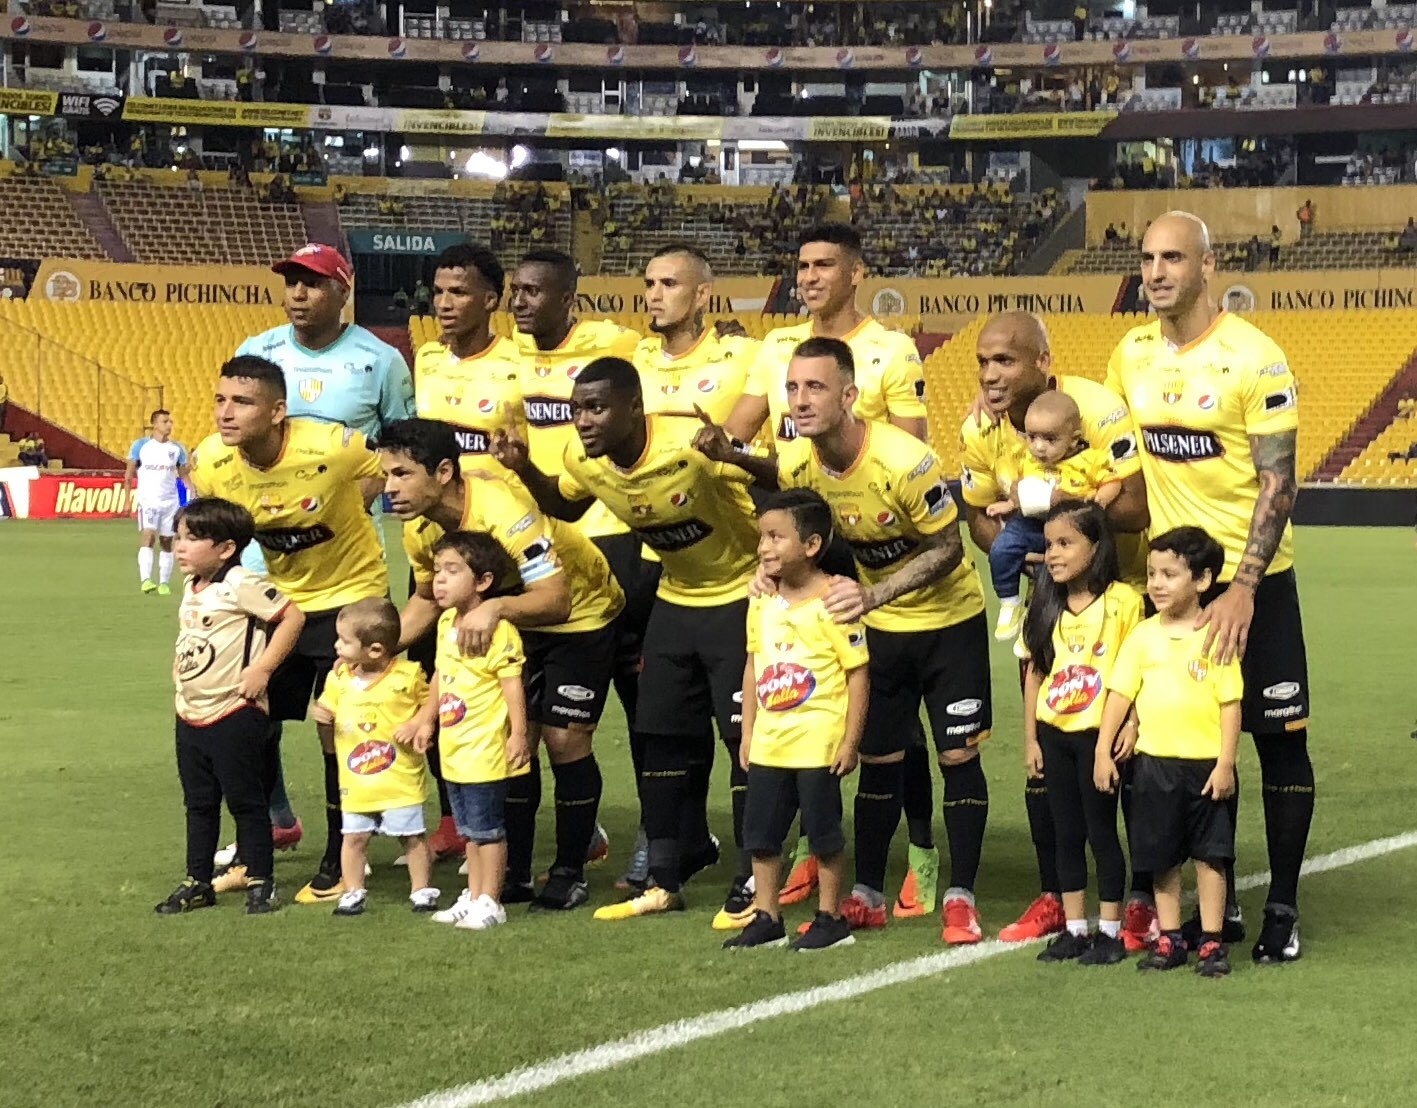 Nómina #BSC  #CopaConmebolSudamericana  Detalles web oficial: https://t.co/UJR2EUuFkh https://t.co/QENDa51my0